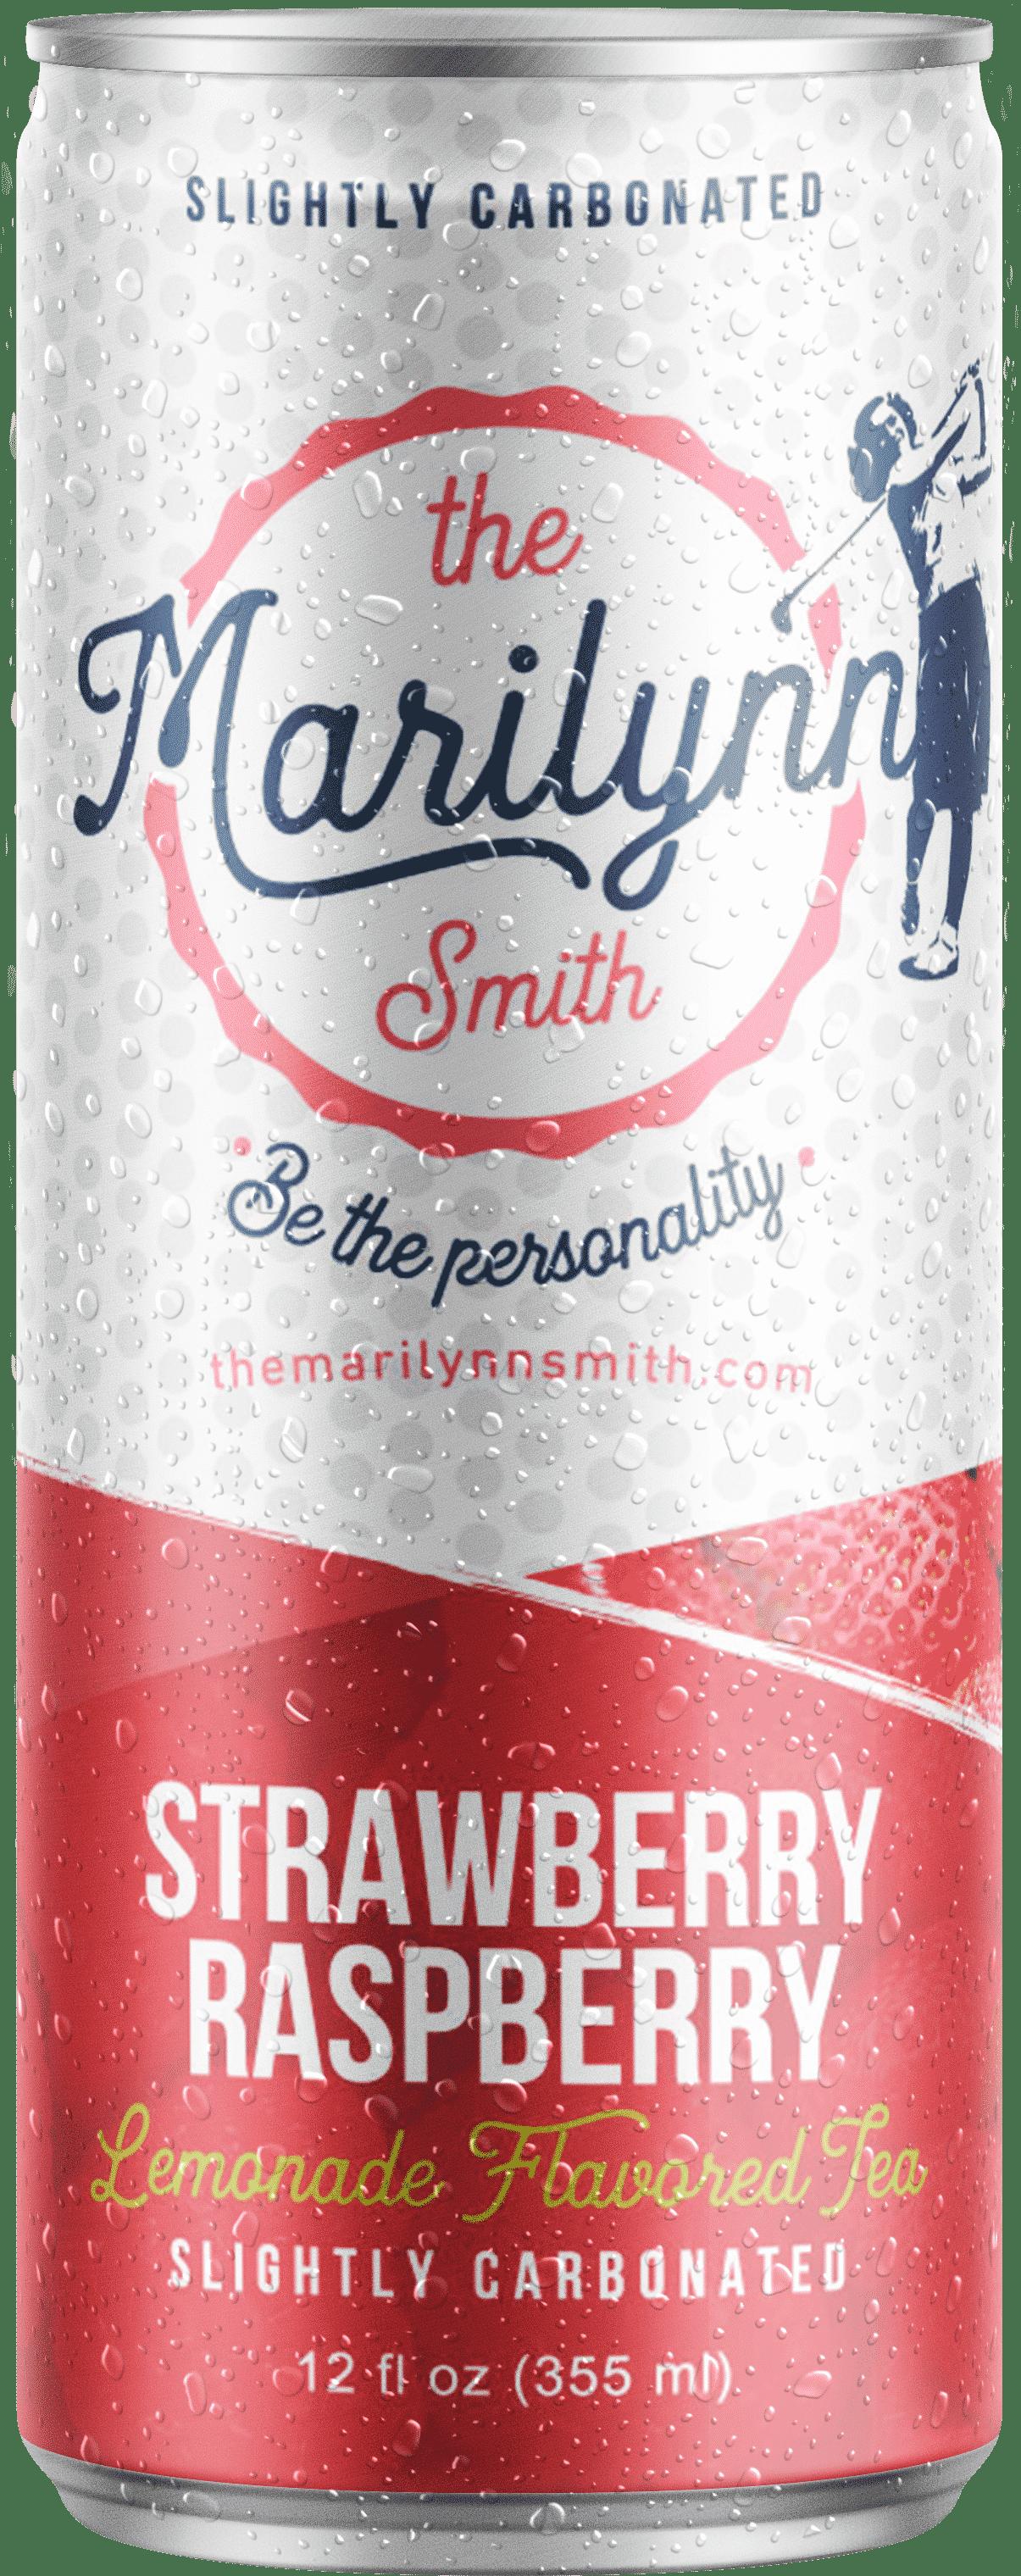 marilynn smith's strawberry iced tea in a 12oz can